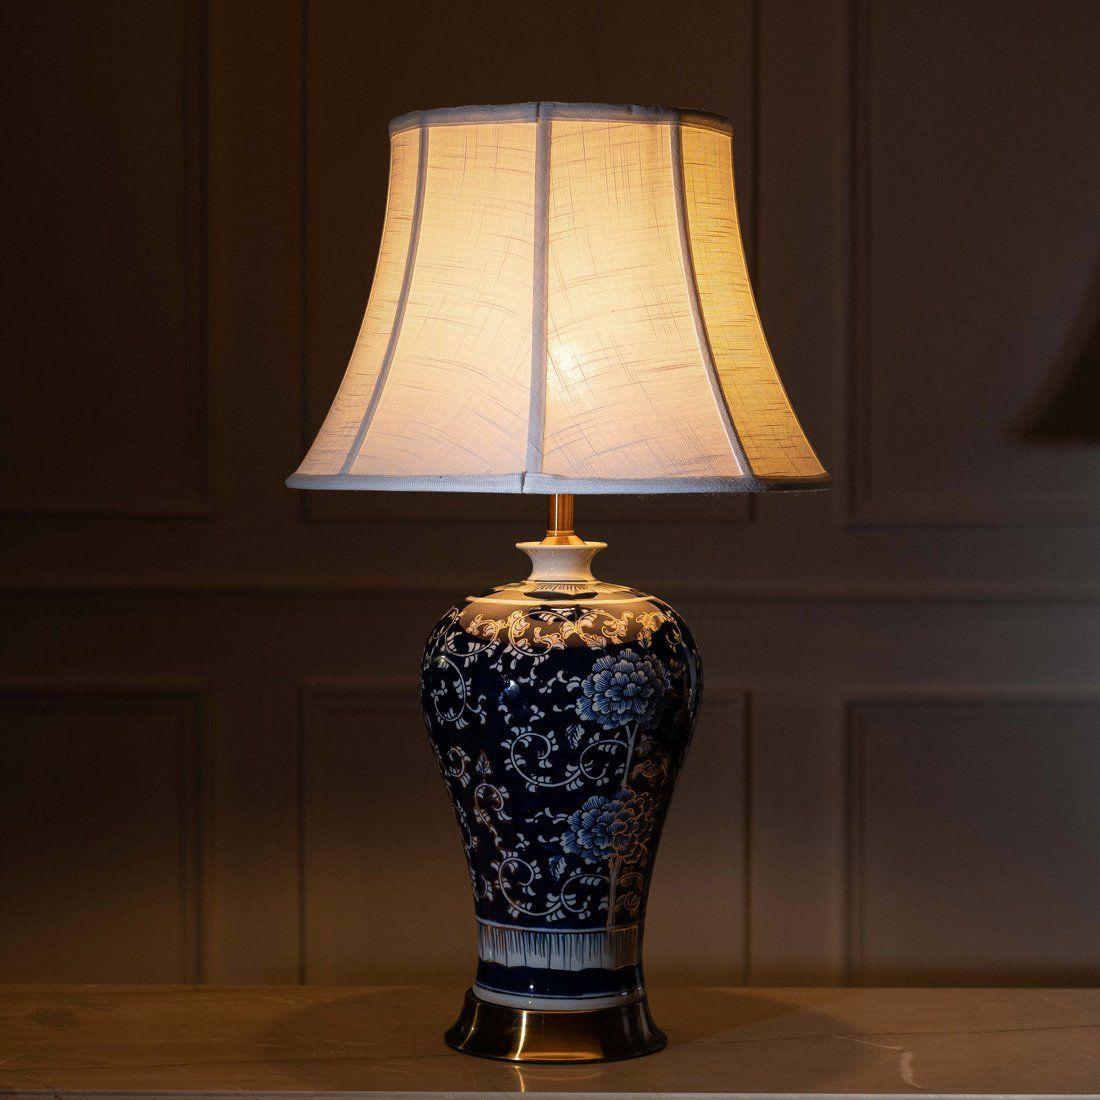 Decadent Ceramic Table Lamp Lamp Table Lamp Study Lamps